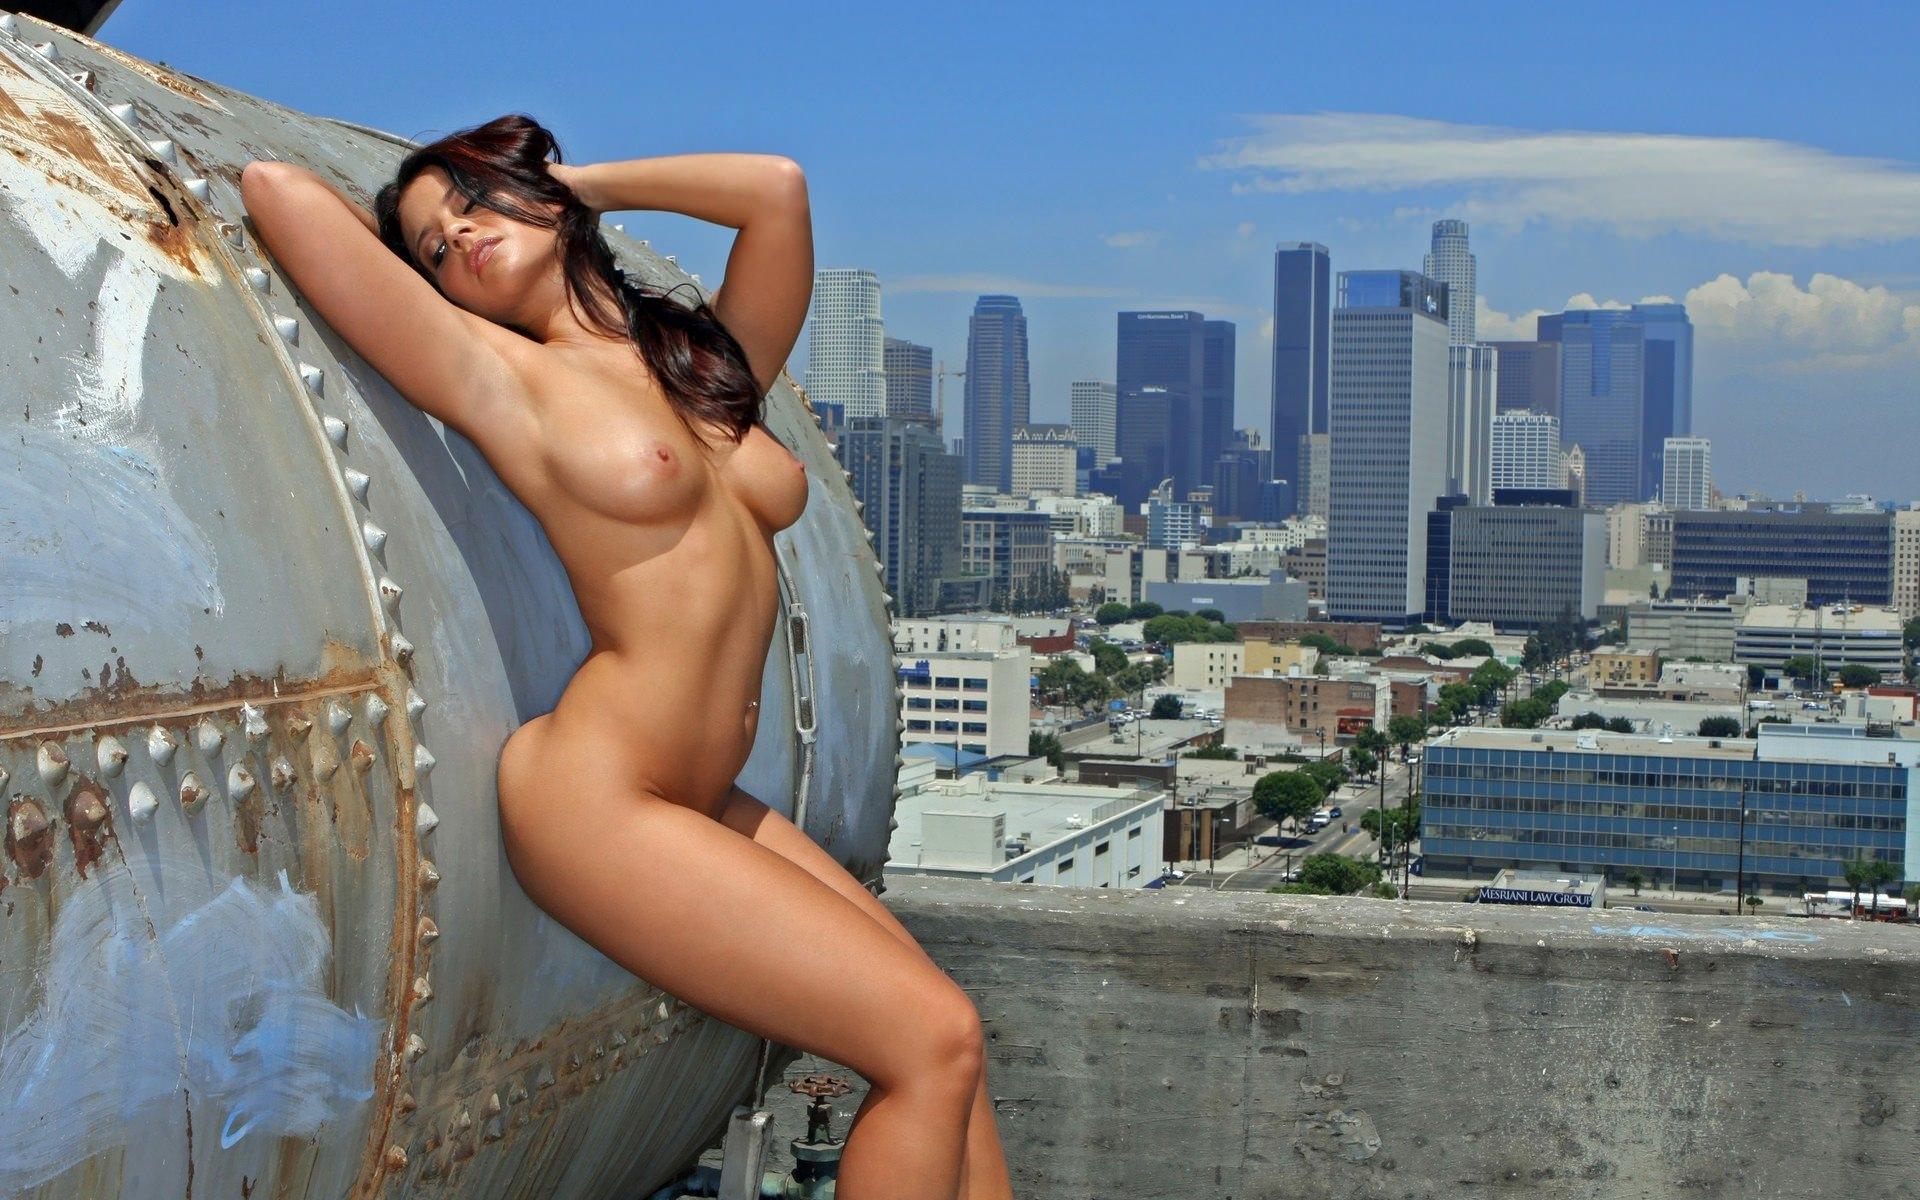 Секс на корыше 14 фотография